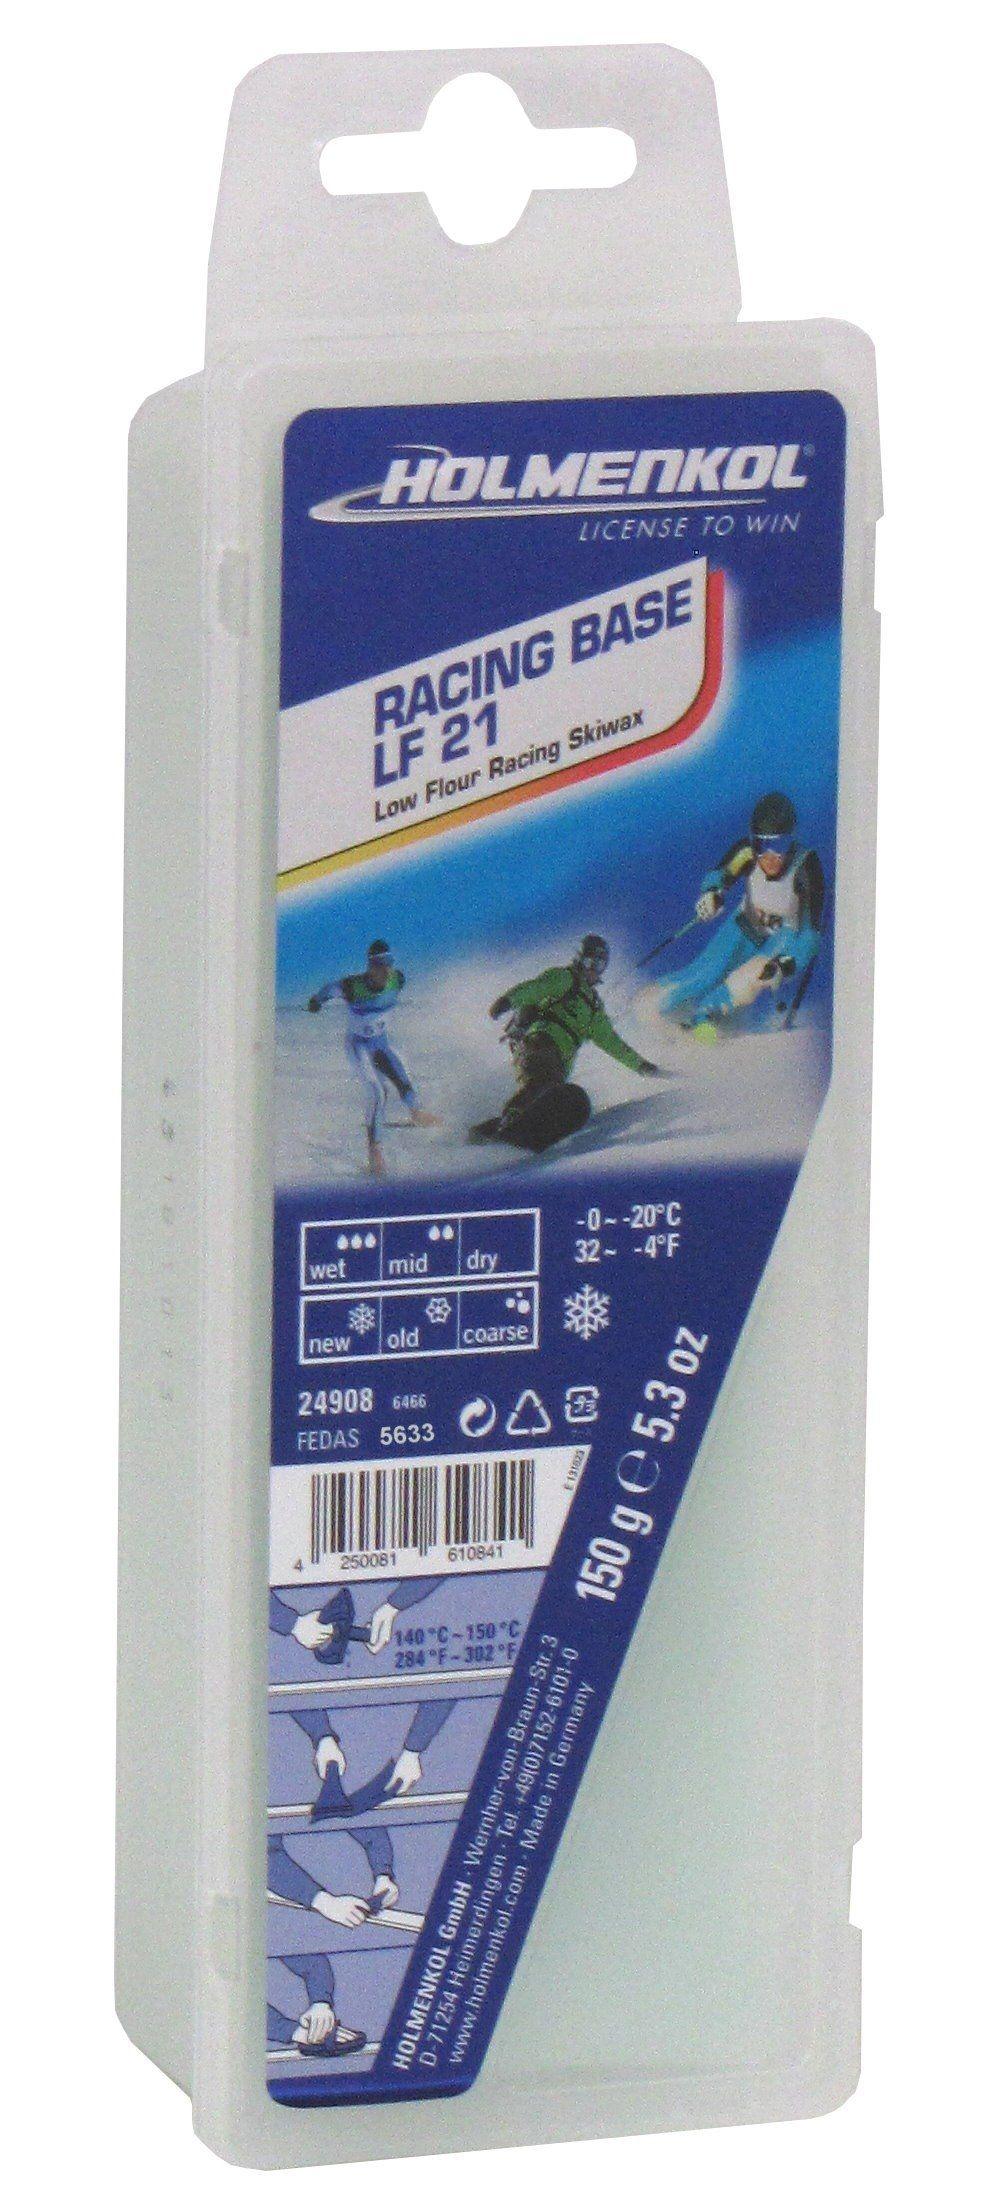 "HOLMENKOL Rennbasiswachs ""RacingBase LF 21"""